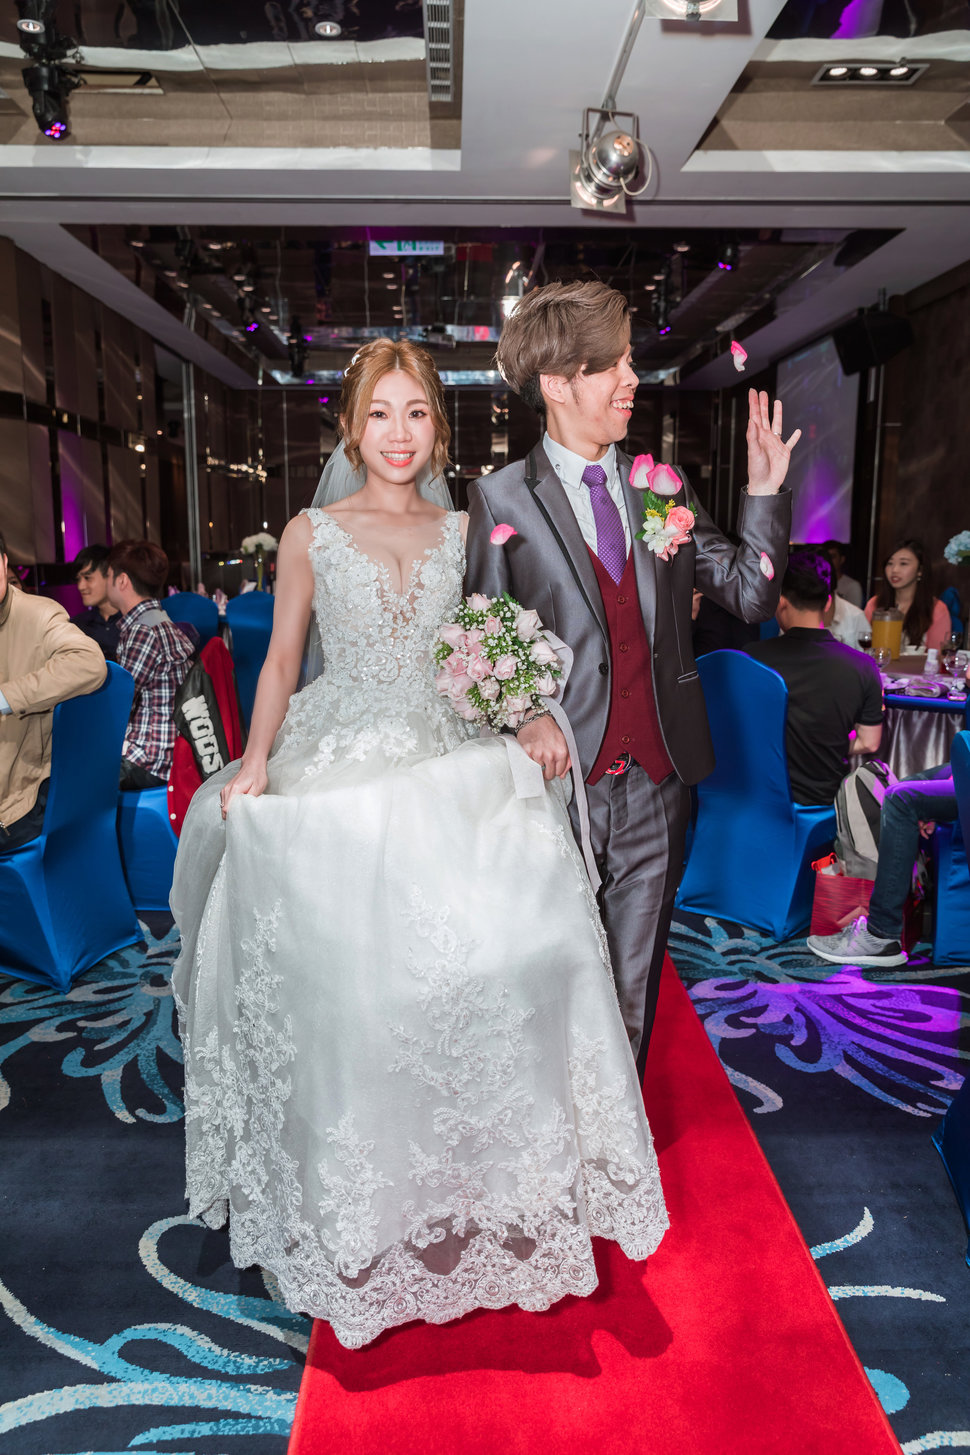 5D4_3903 - Promaker婚禮紀錄攝影團隊婚攝豪哥《結婚吧》